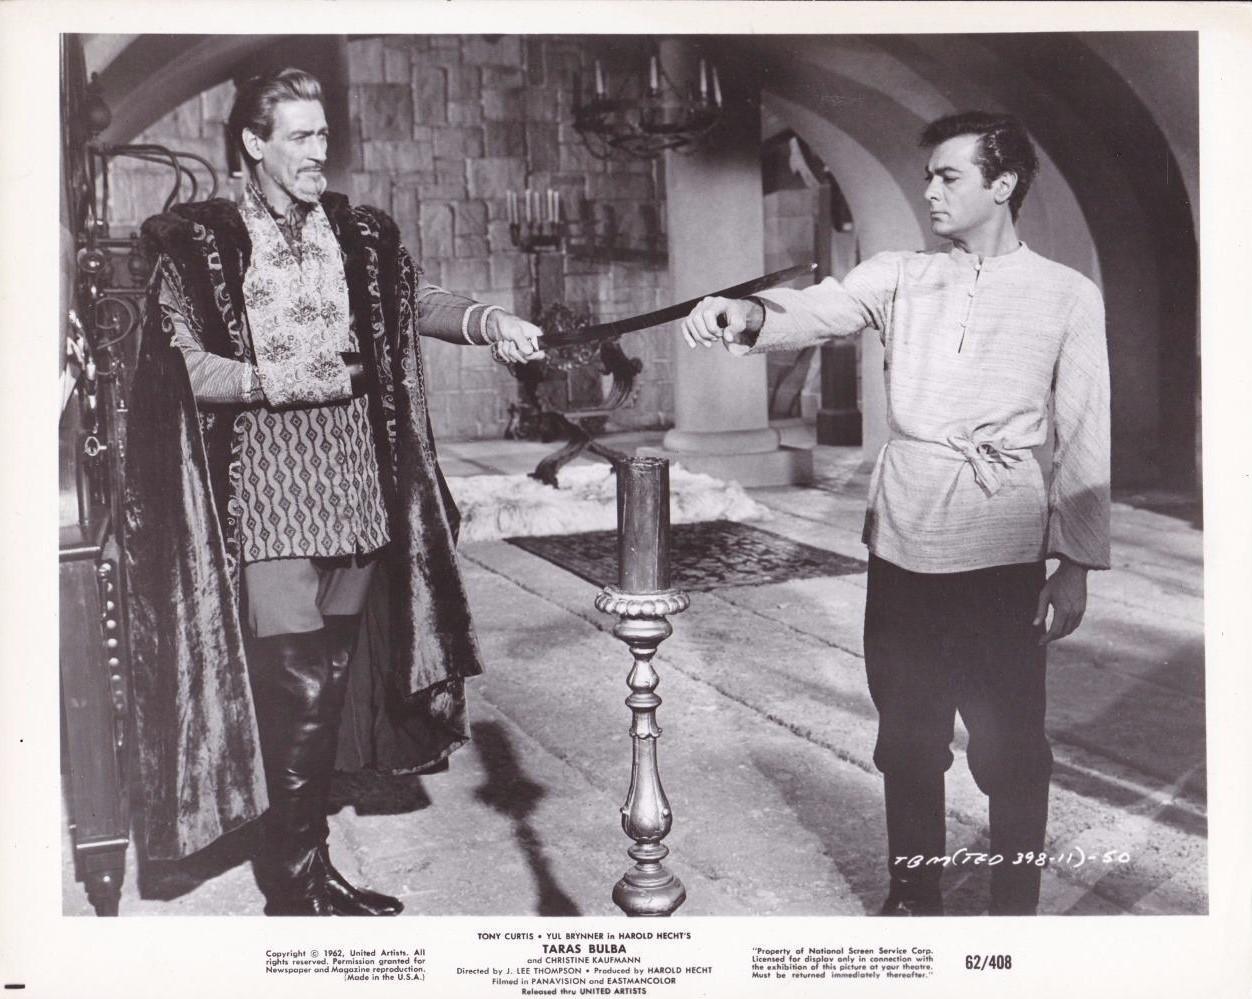 Tony Curtis and Guy Rolfe in Taras Bulba (1962)